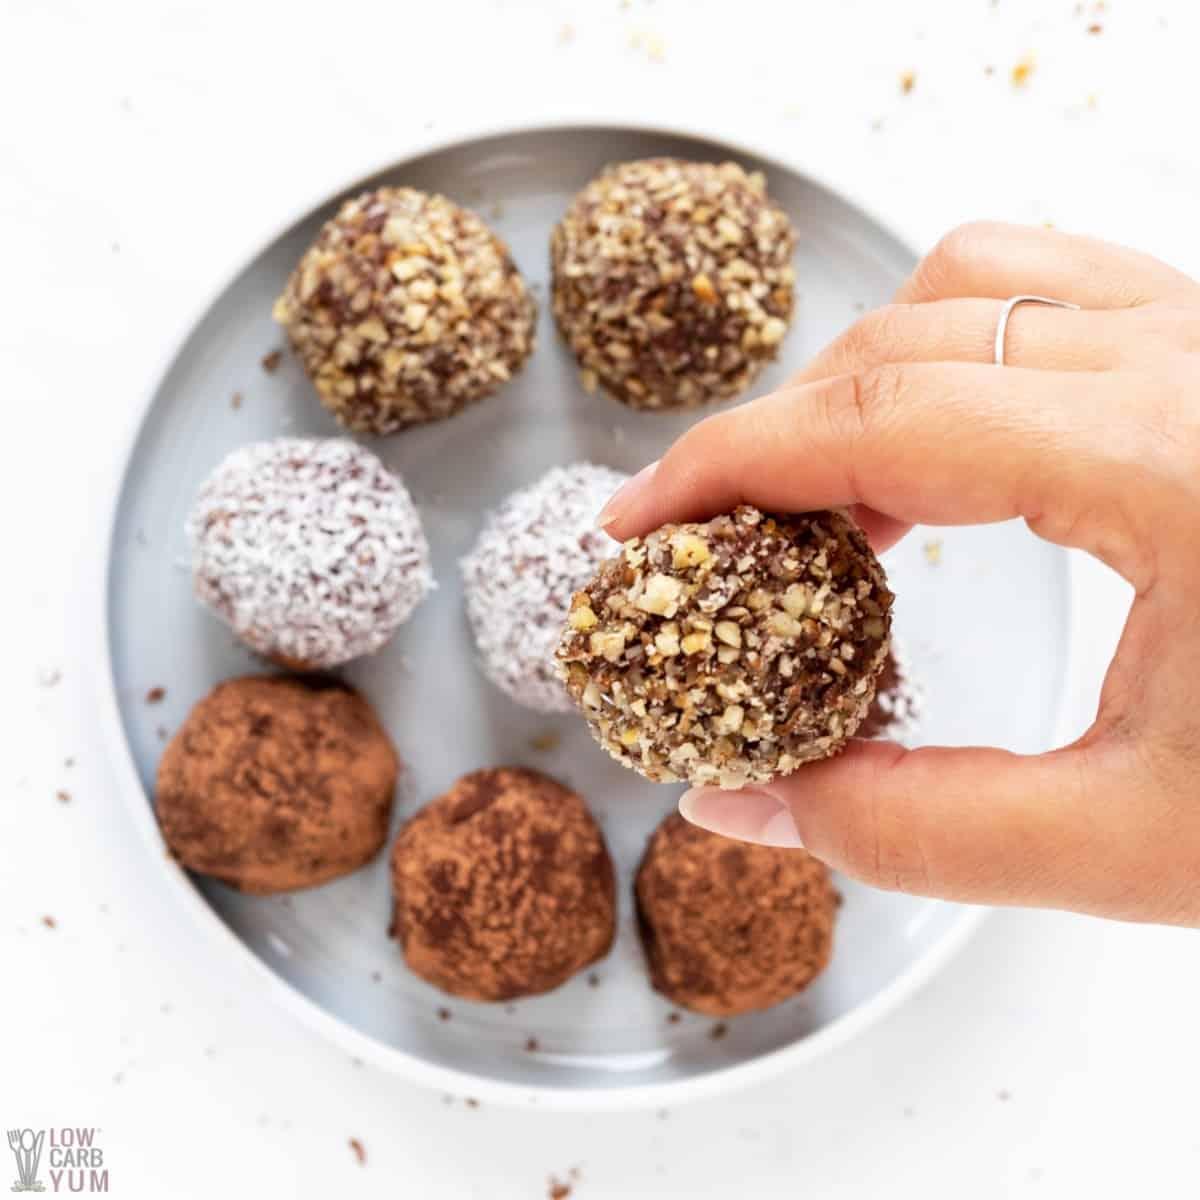 hand picking up nut covered chocolate cream cheese ball truffle